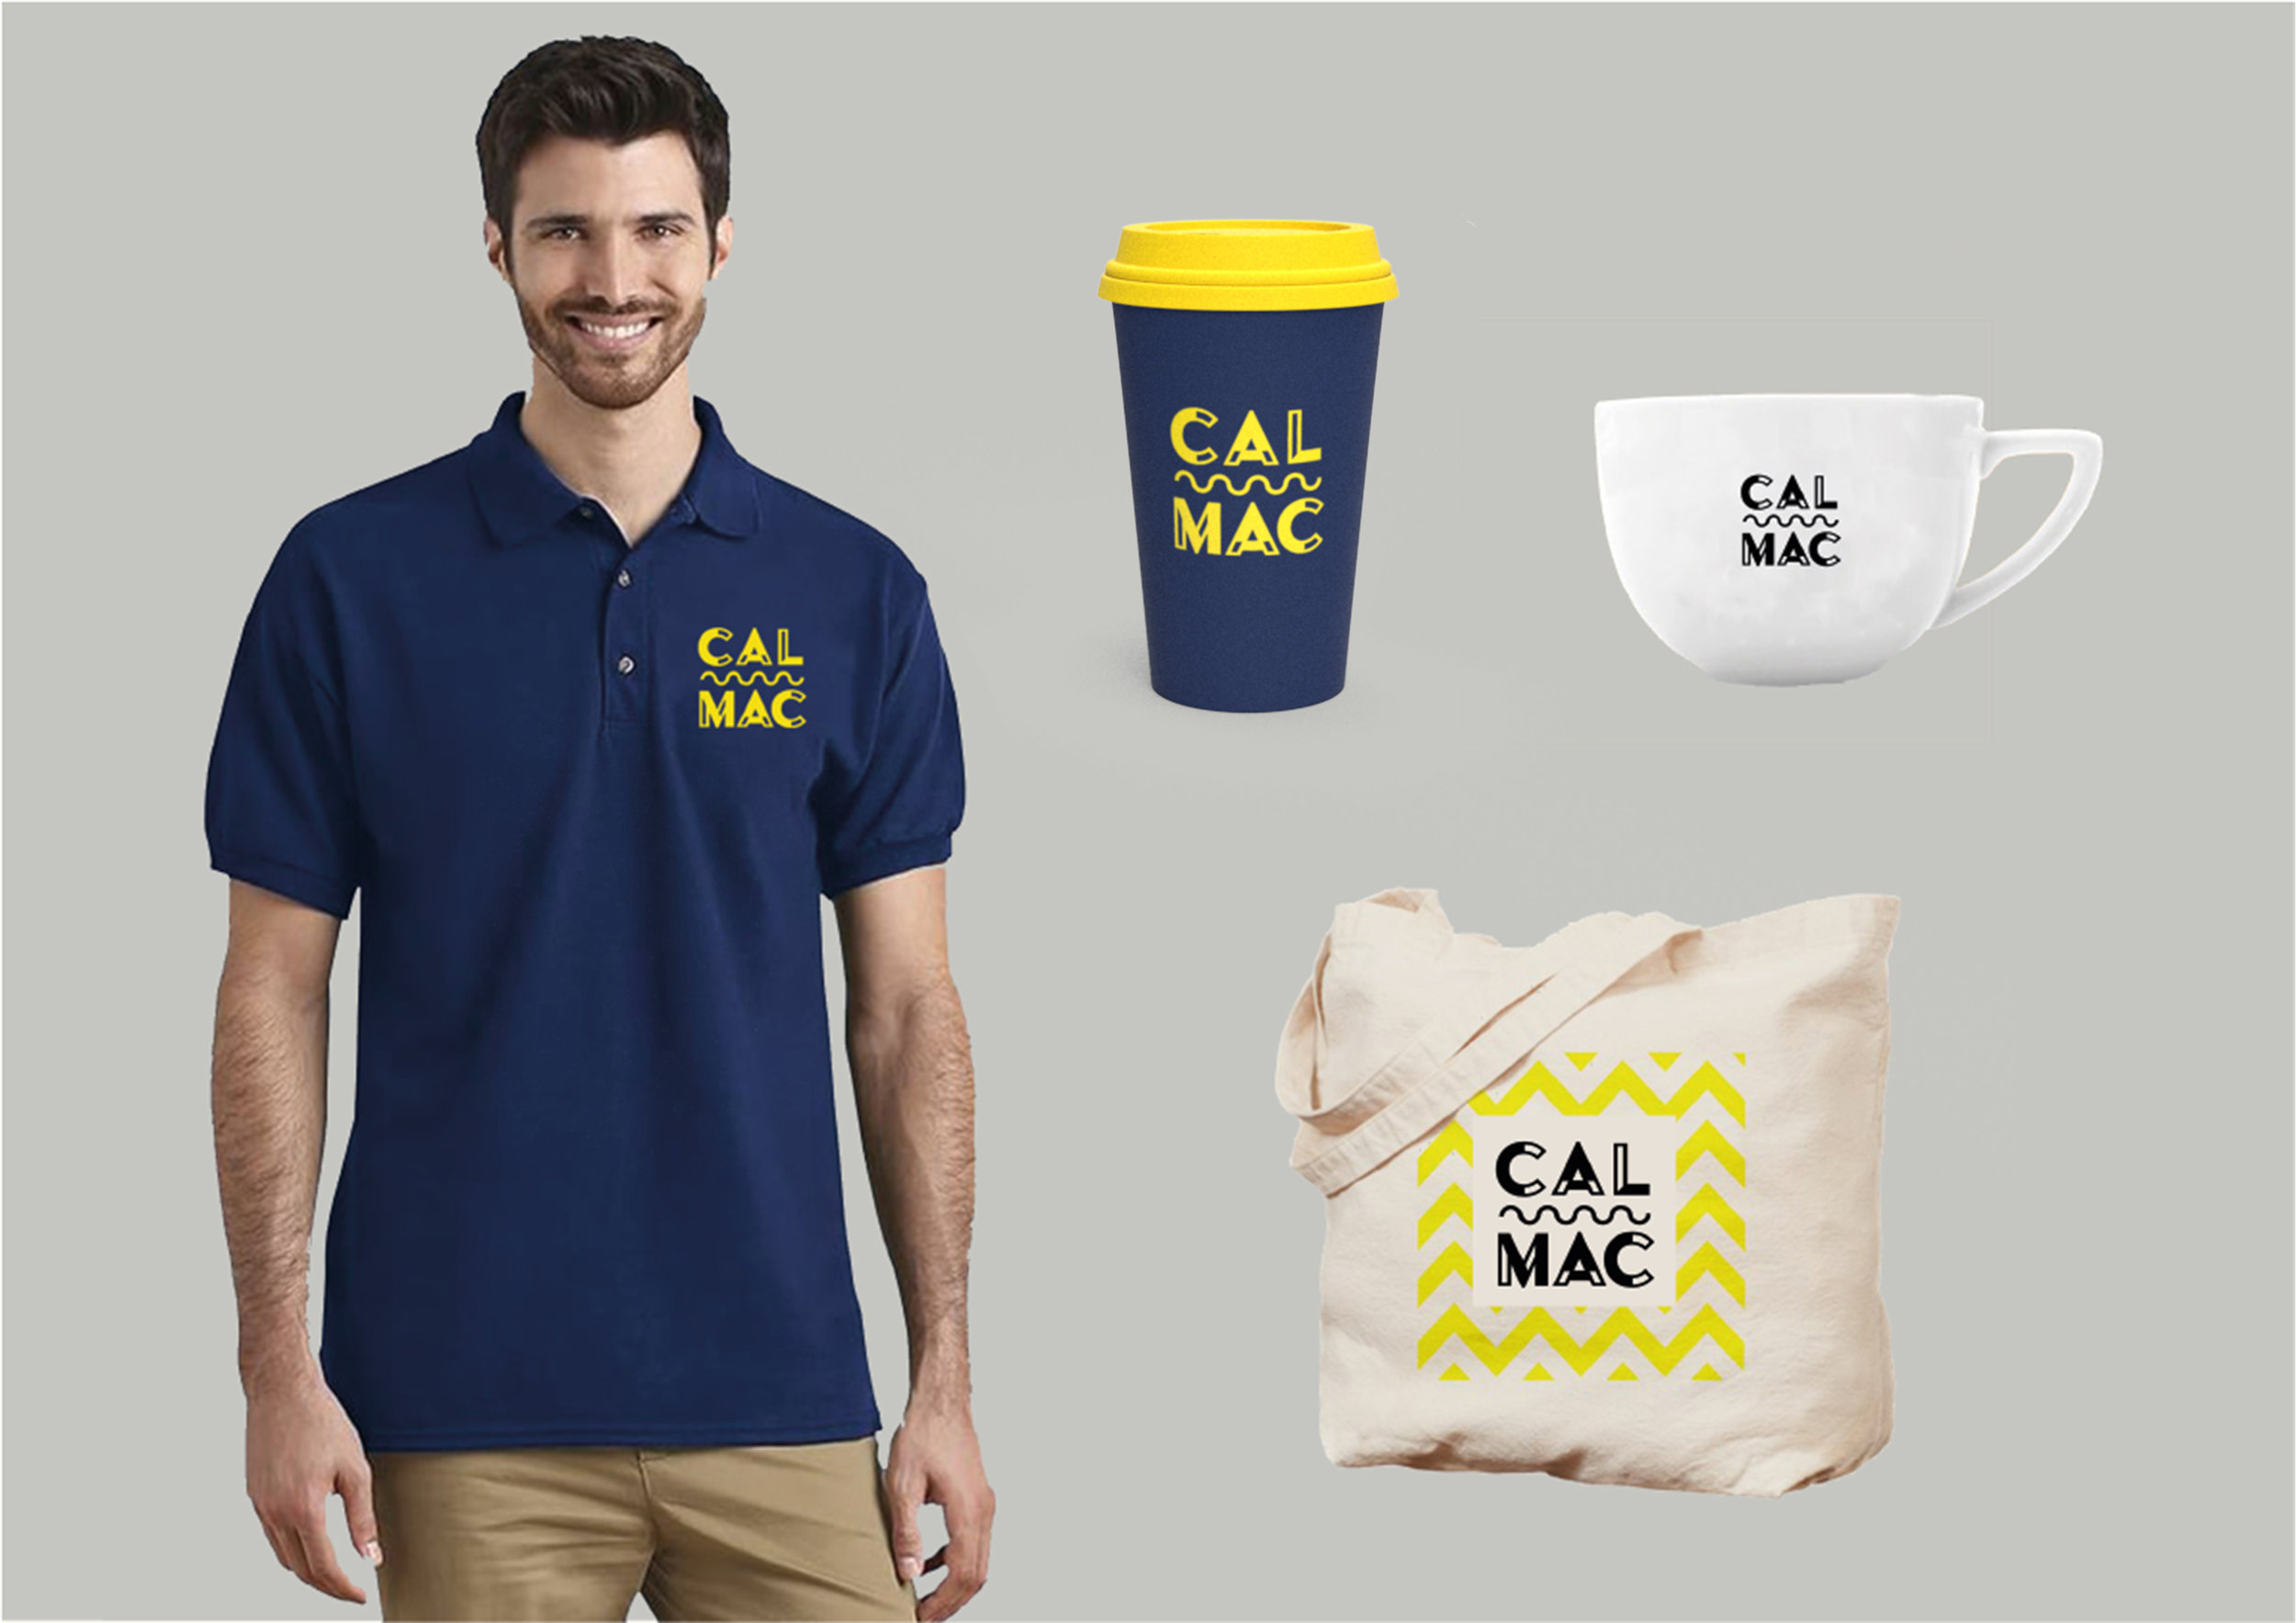 calmacmerch2.jpg